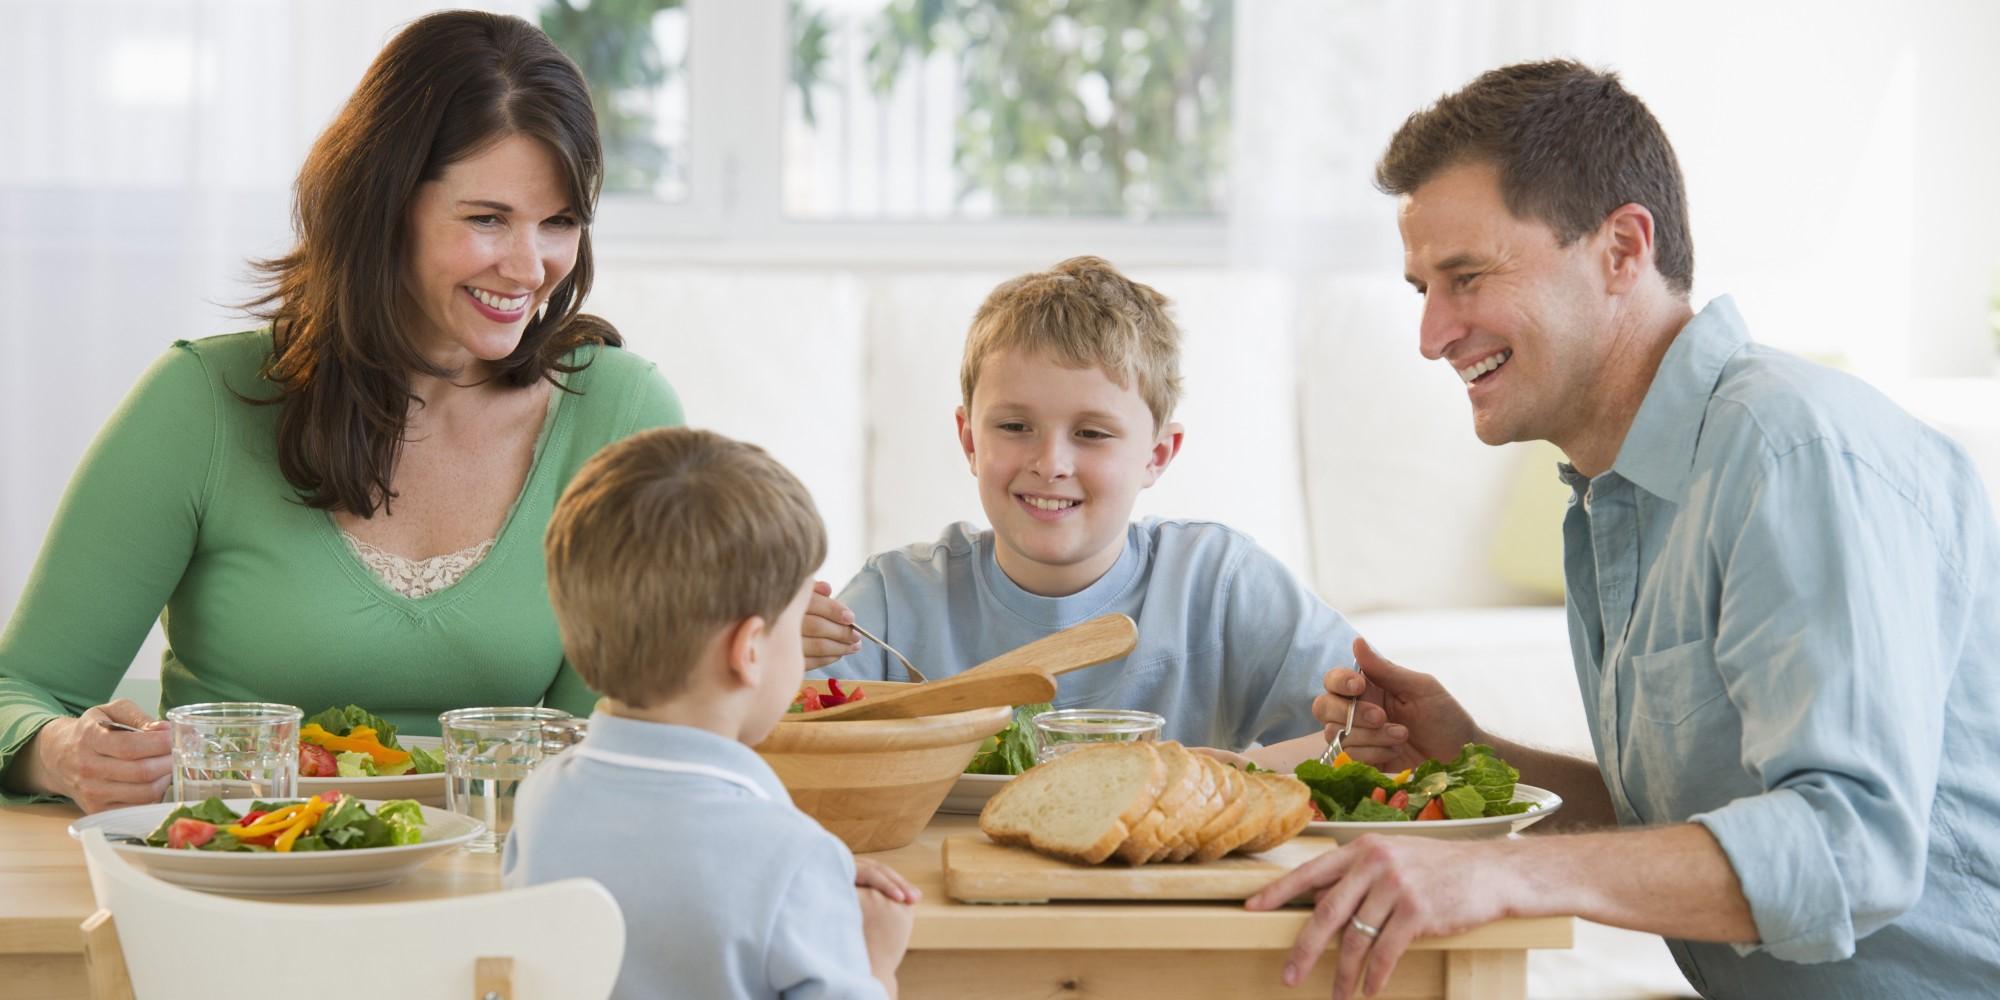 Dads, Ini Pentingnya Makan Malam Bersama Keluarga!